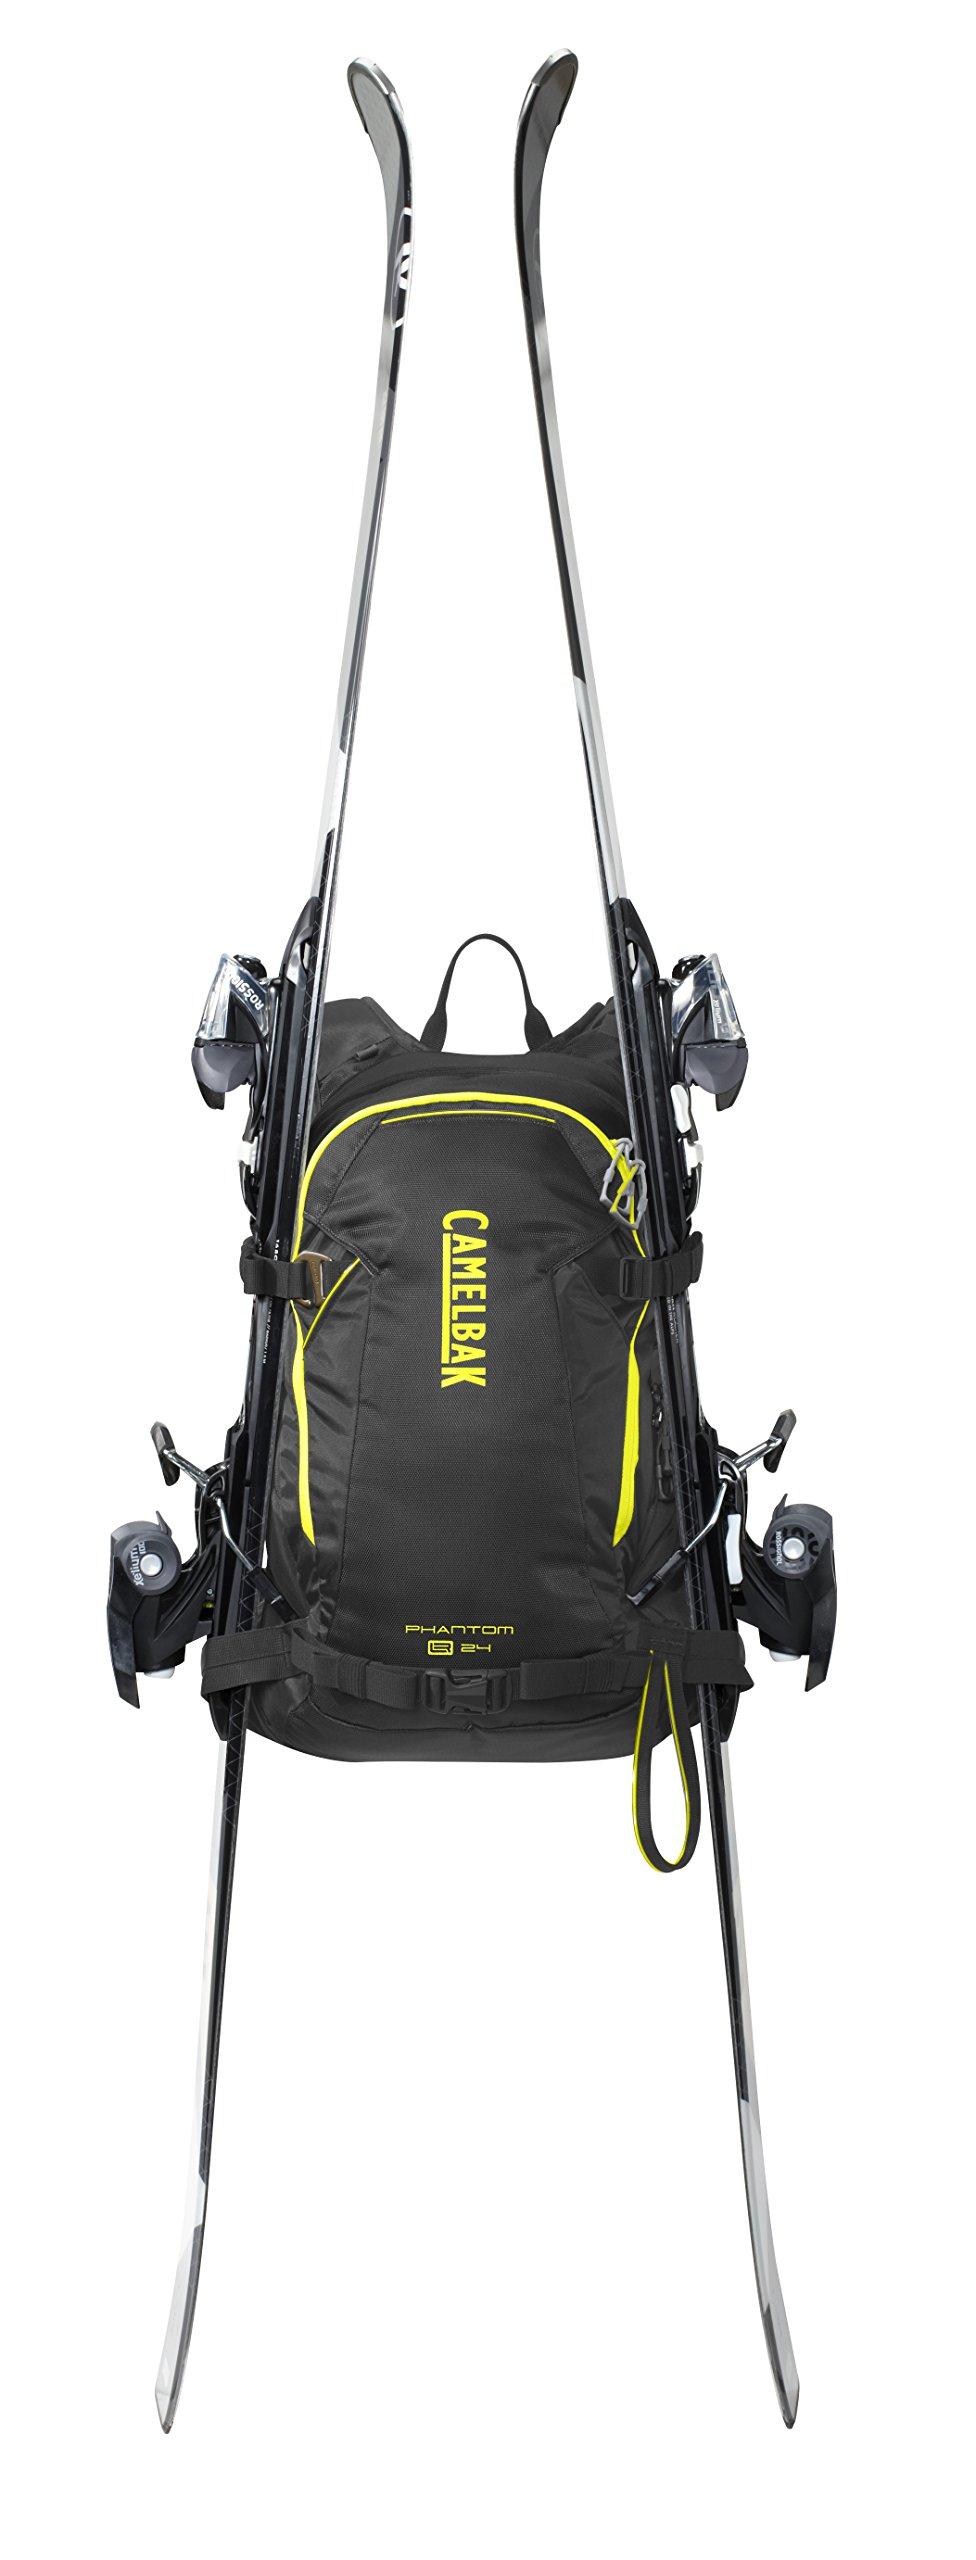 Camelbak Phantom LR 24 Ski Hydration Pack, Black/Sulphur Springs (3L/100oz) by CamelBak (Image #4)